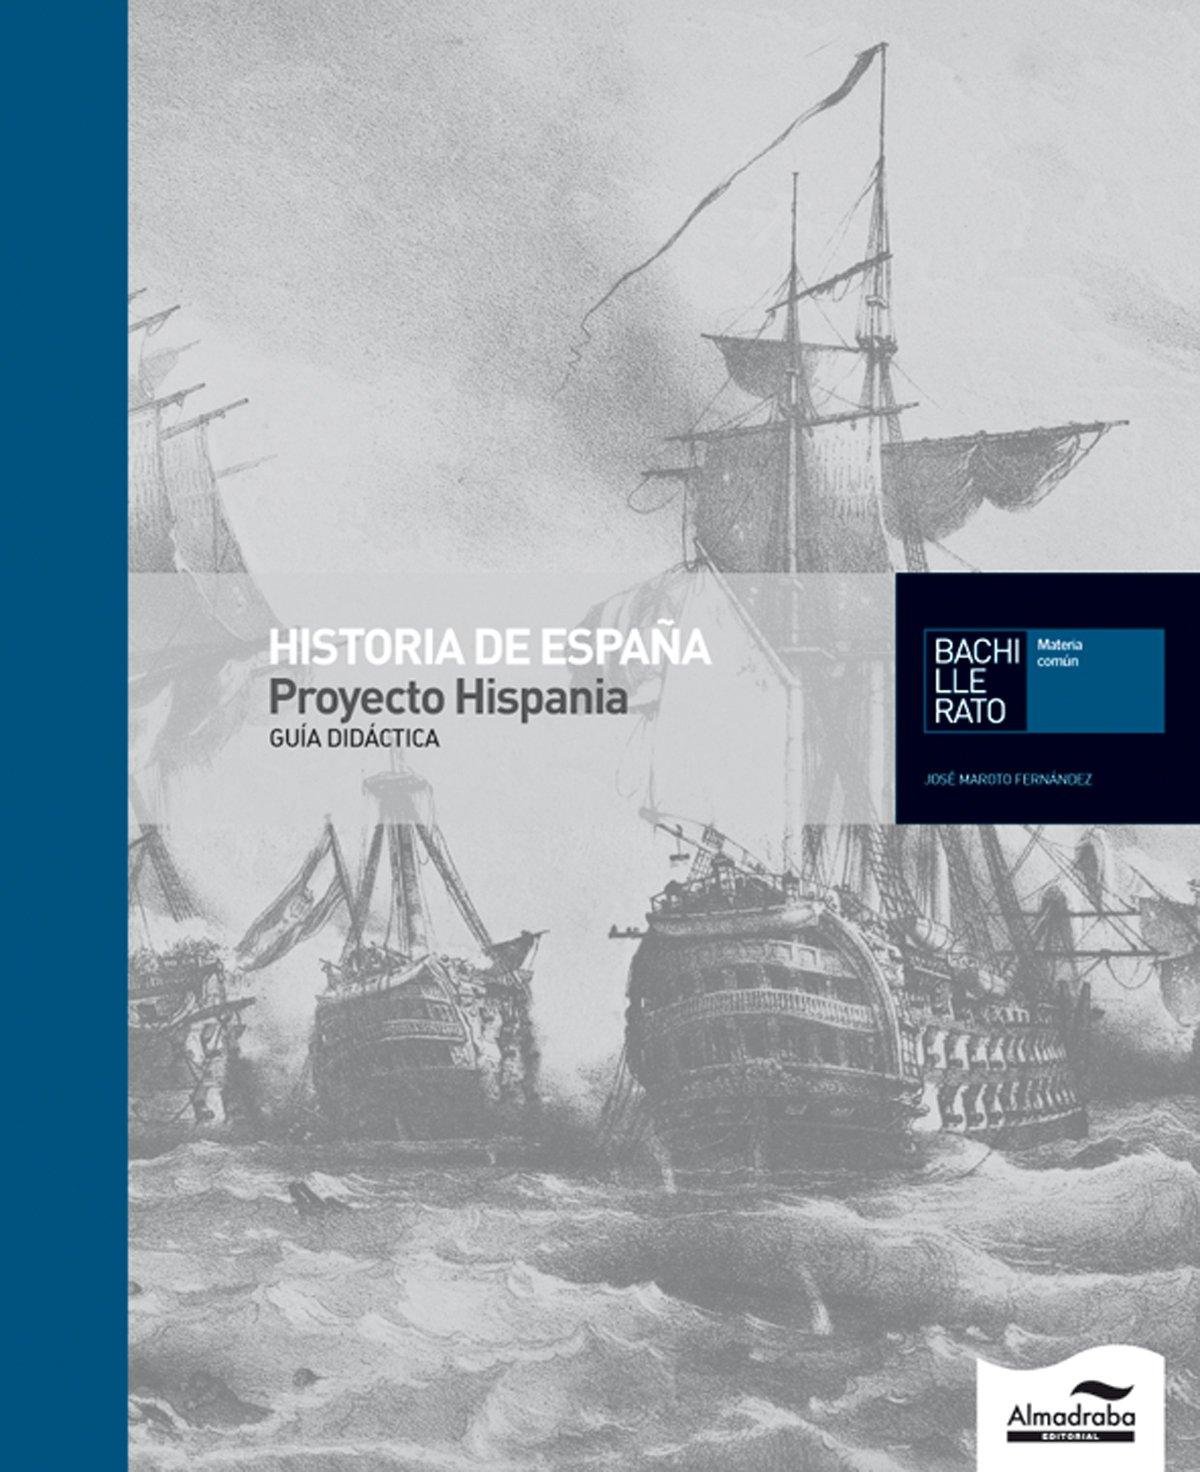 Guía Didáctica Historia de España-Proyecto Hispania Bachillerato: Amazon.es: Maroto Fernández, Jose: Libros